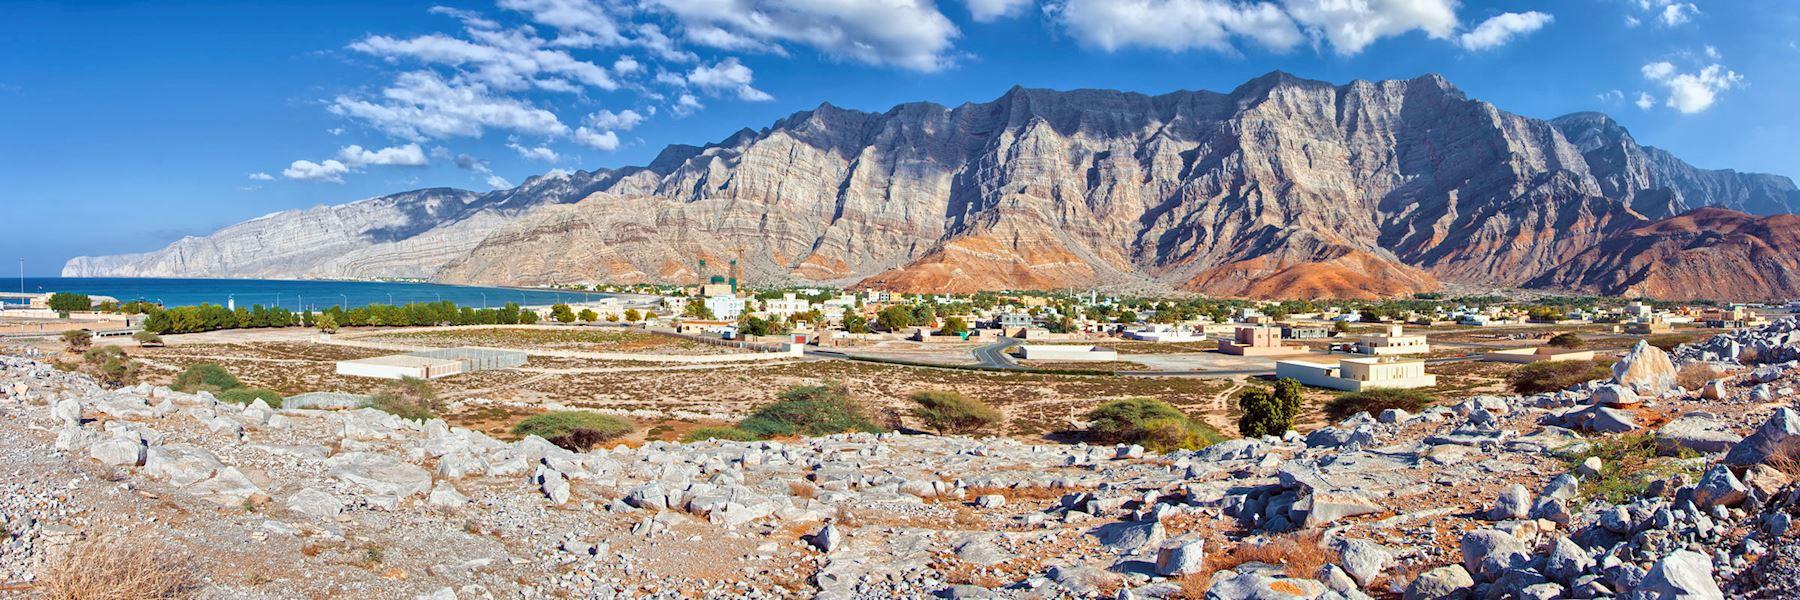 Visit the Musandam Peninsula, Oman